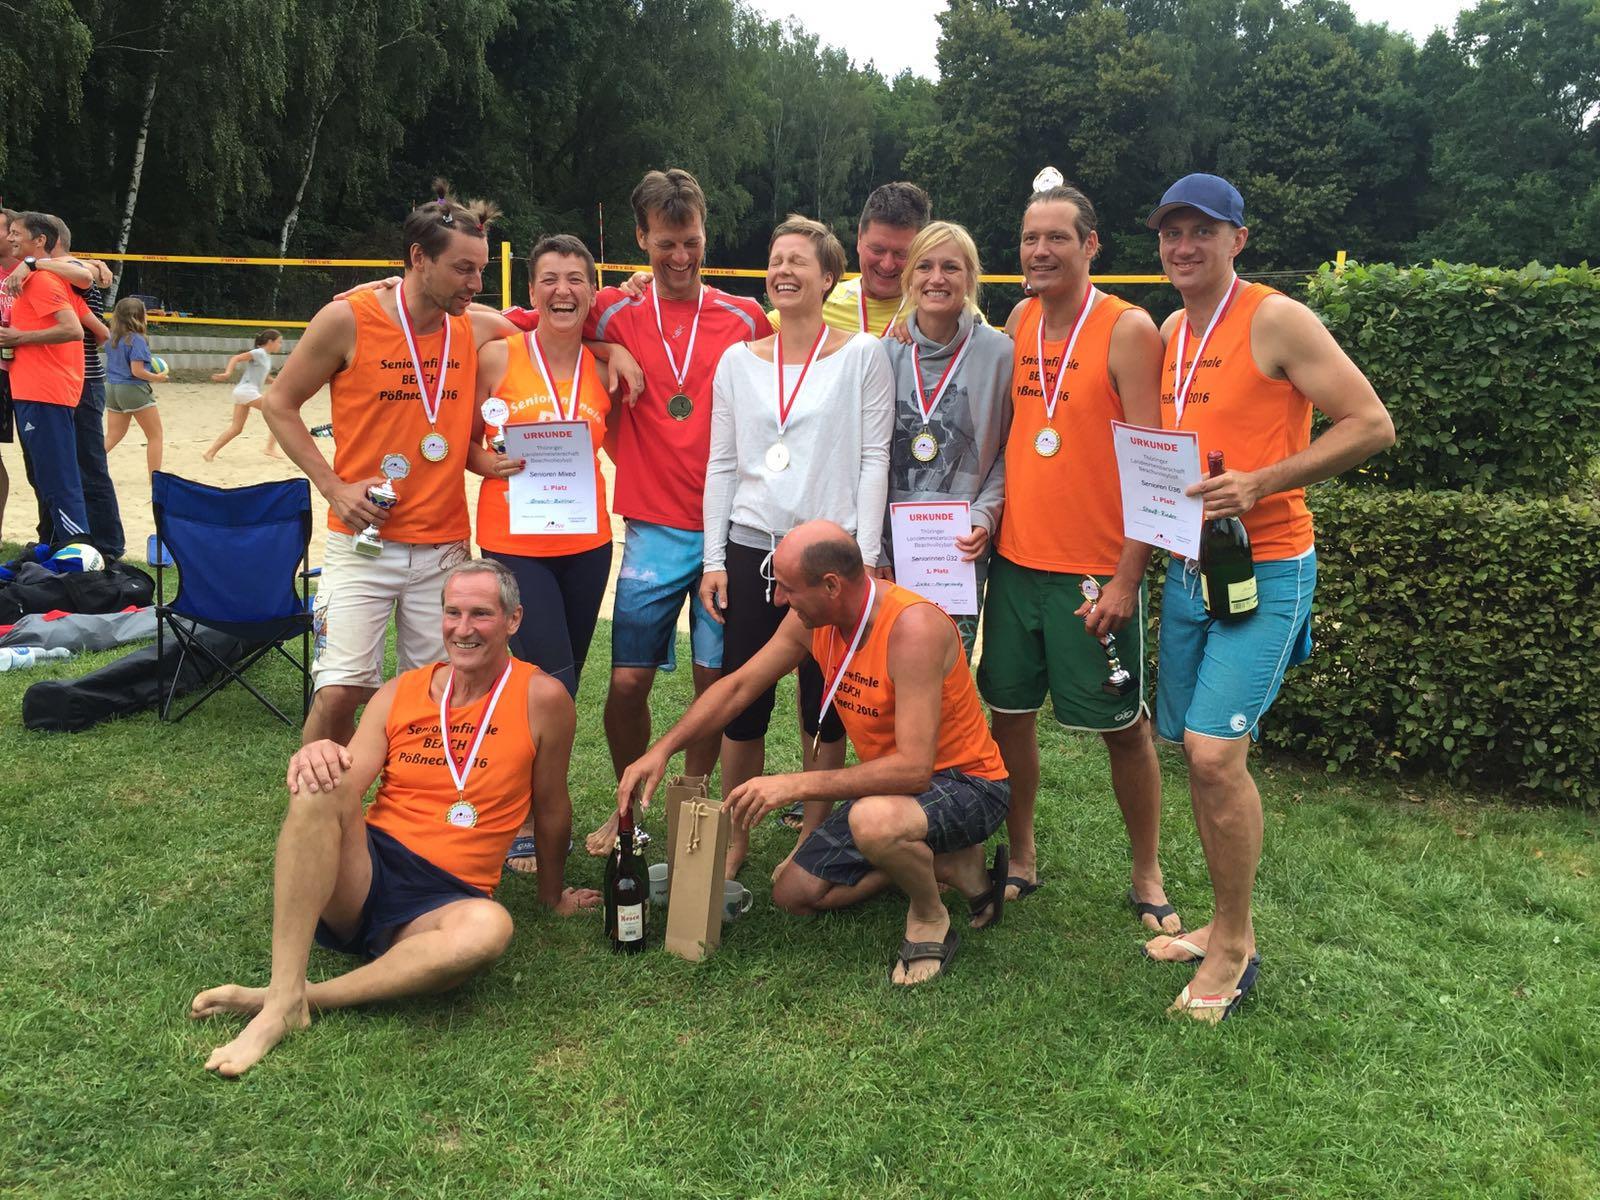 Teilnehmerrekord im Pößnecker Sand